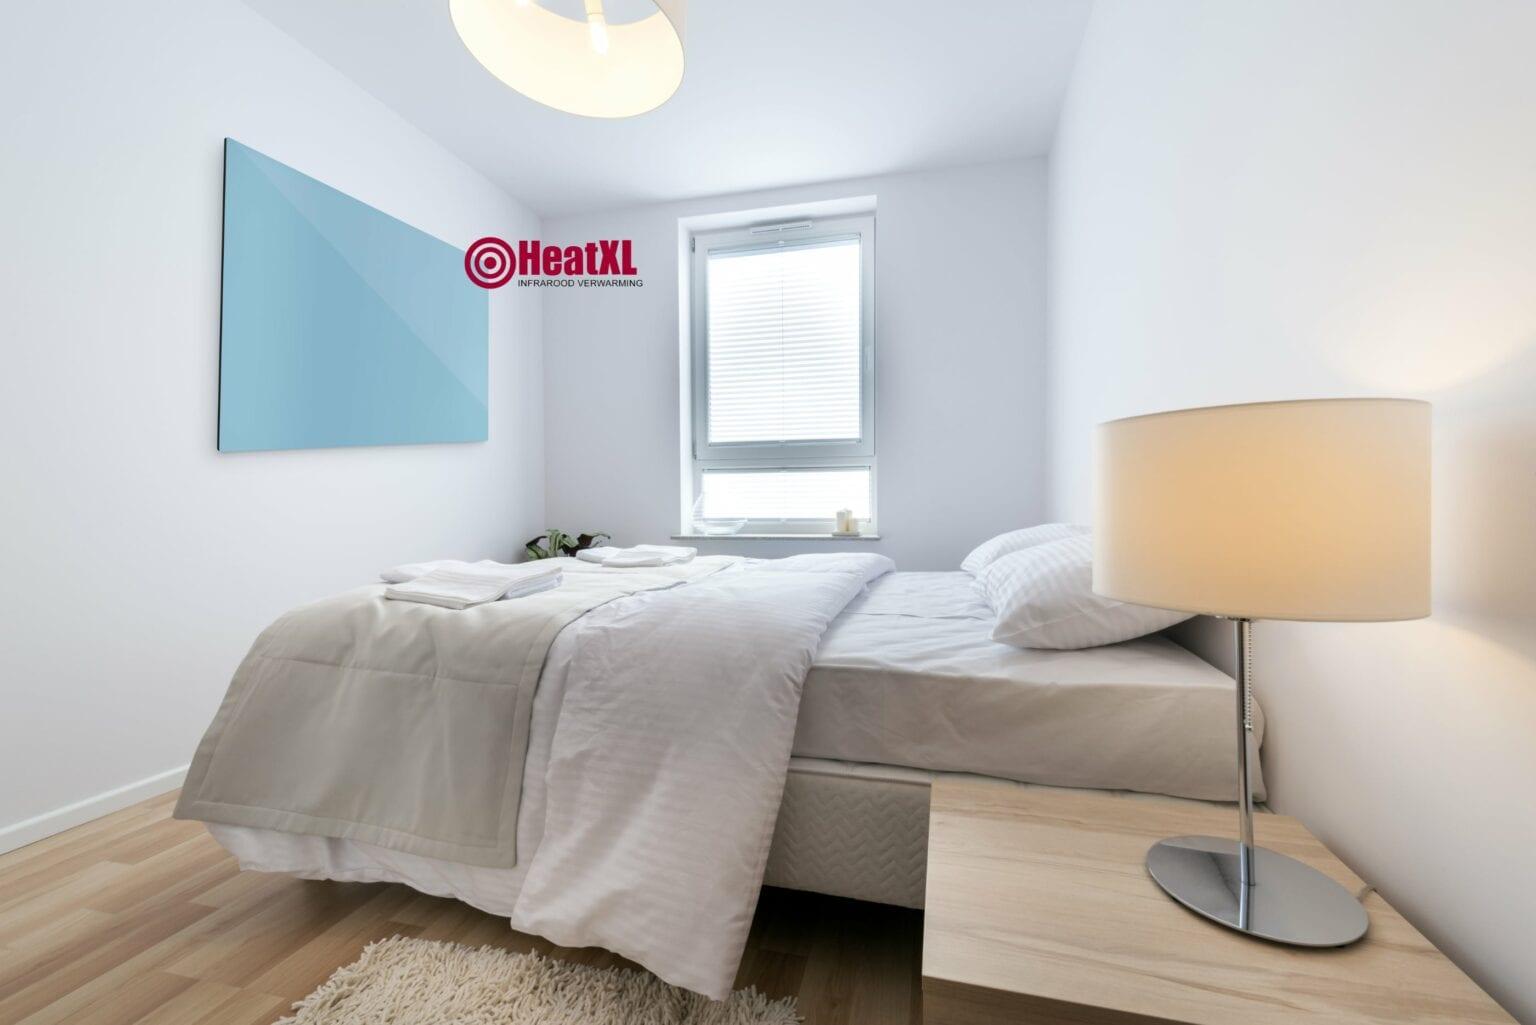 Infraroodpaneel infrarood panelen infrarood verwarming warmtepaneel verwarmingspaneel, plafond wand